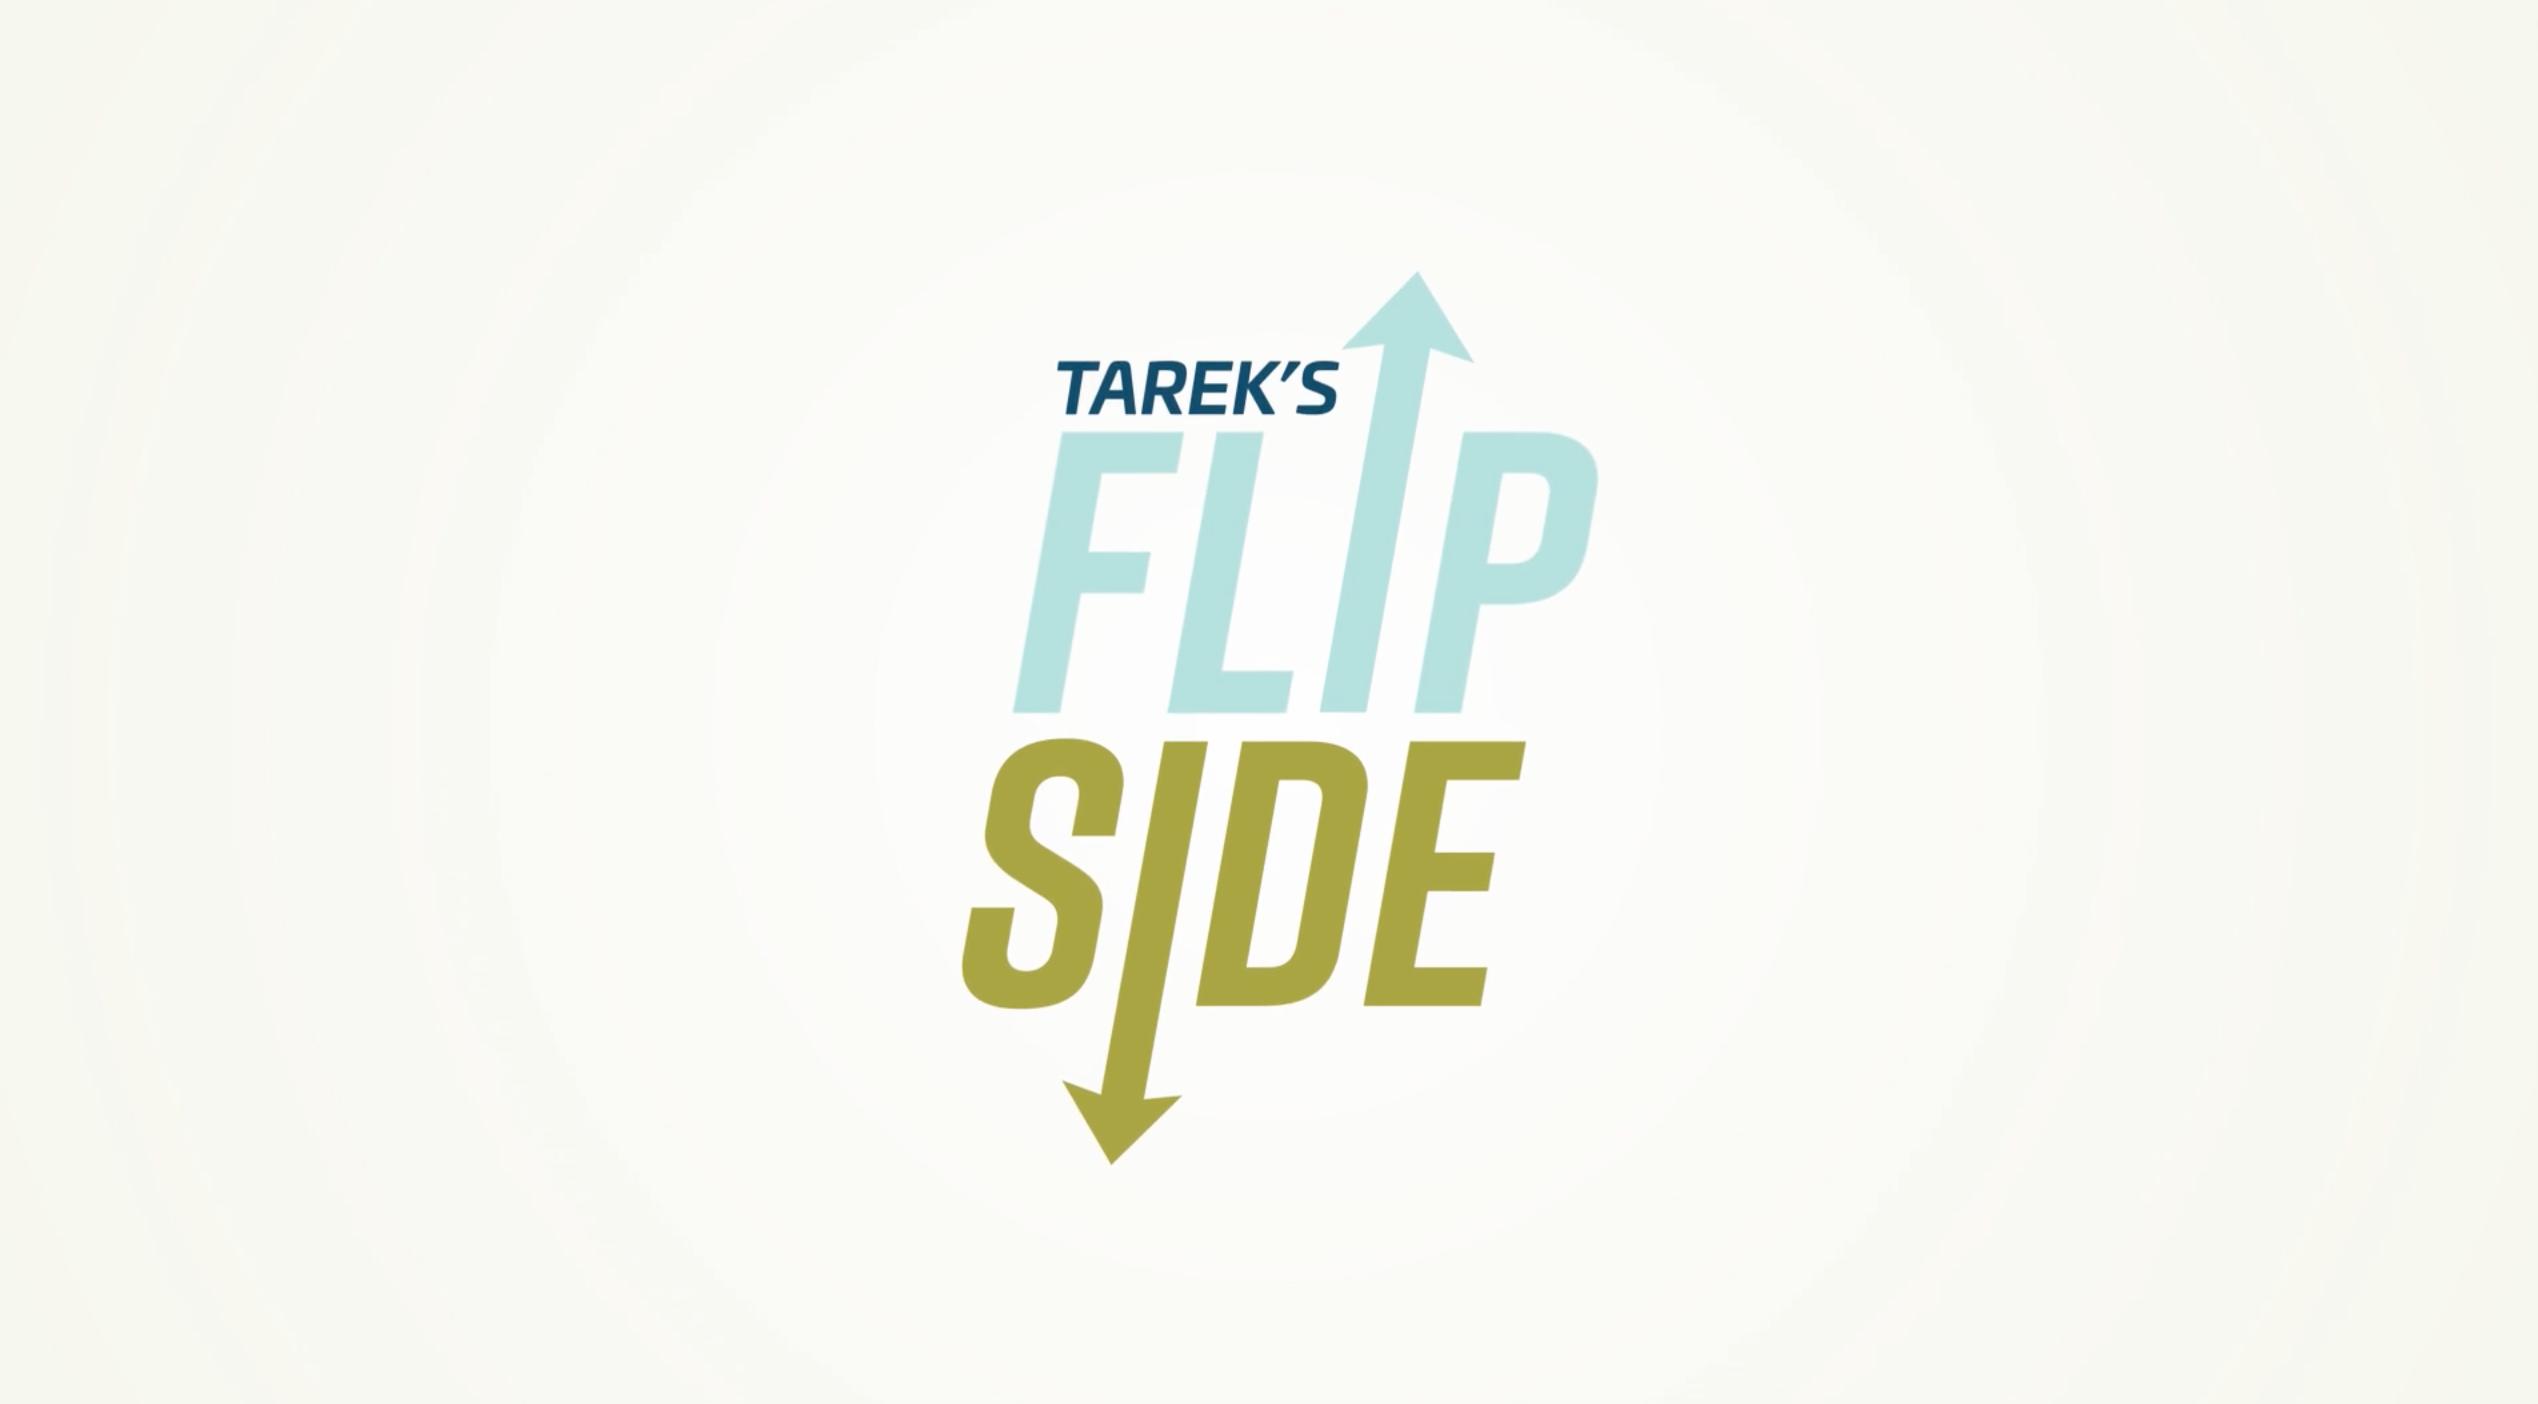 Tarek's Flip Side